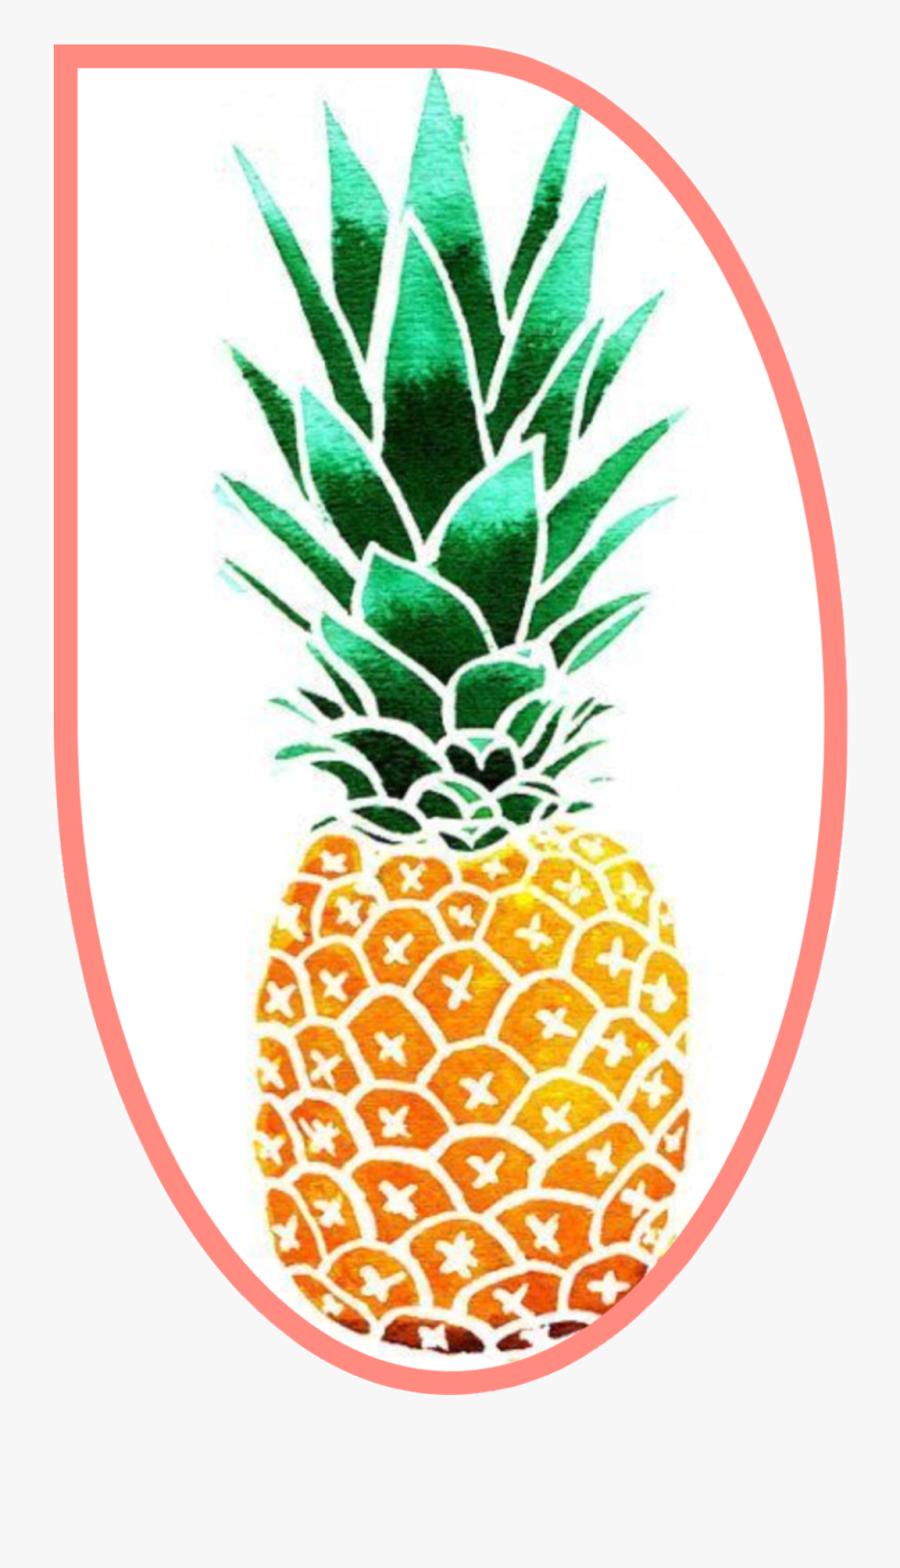 #fruit #pineapple #outline #freetoedit - Cartoon Pineapple, Transparent Clipart